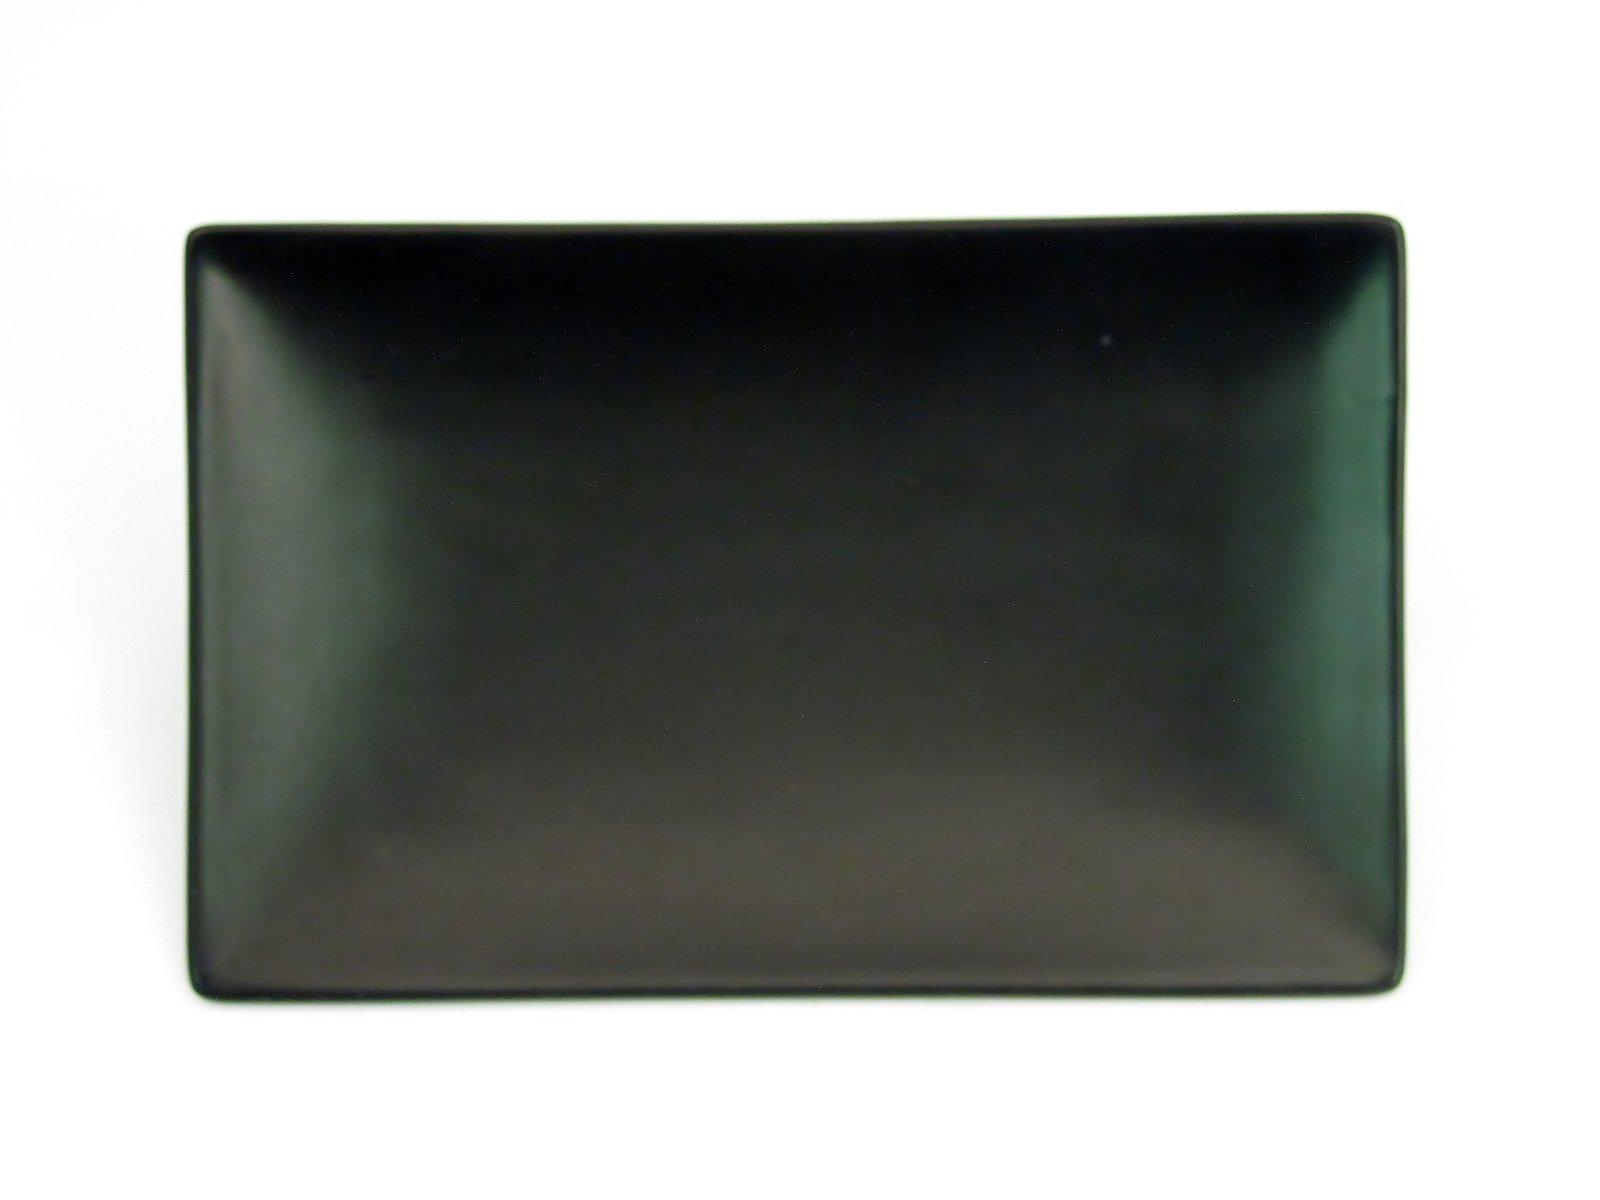 CAC China 666-34-BK Japanese Style 8-1/2-Inch by 5-1/2-Inch Non Glare Glaze Black Rectangular Platter, Box of 24